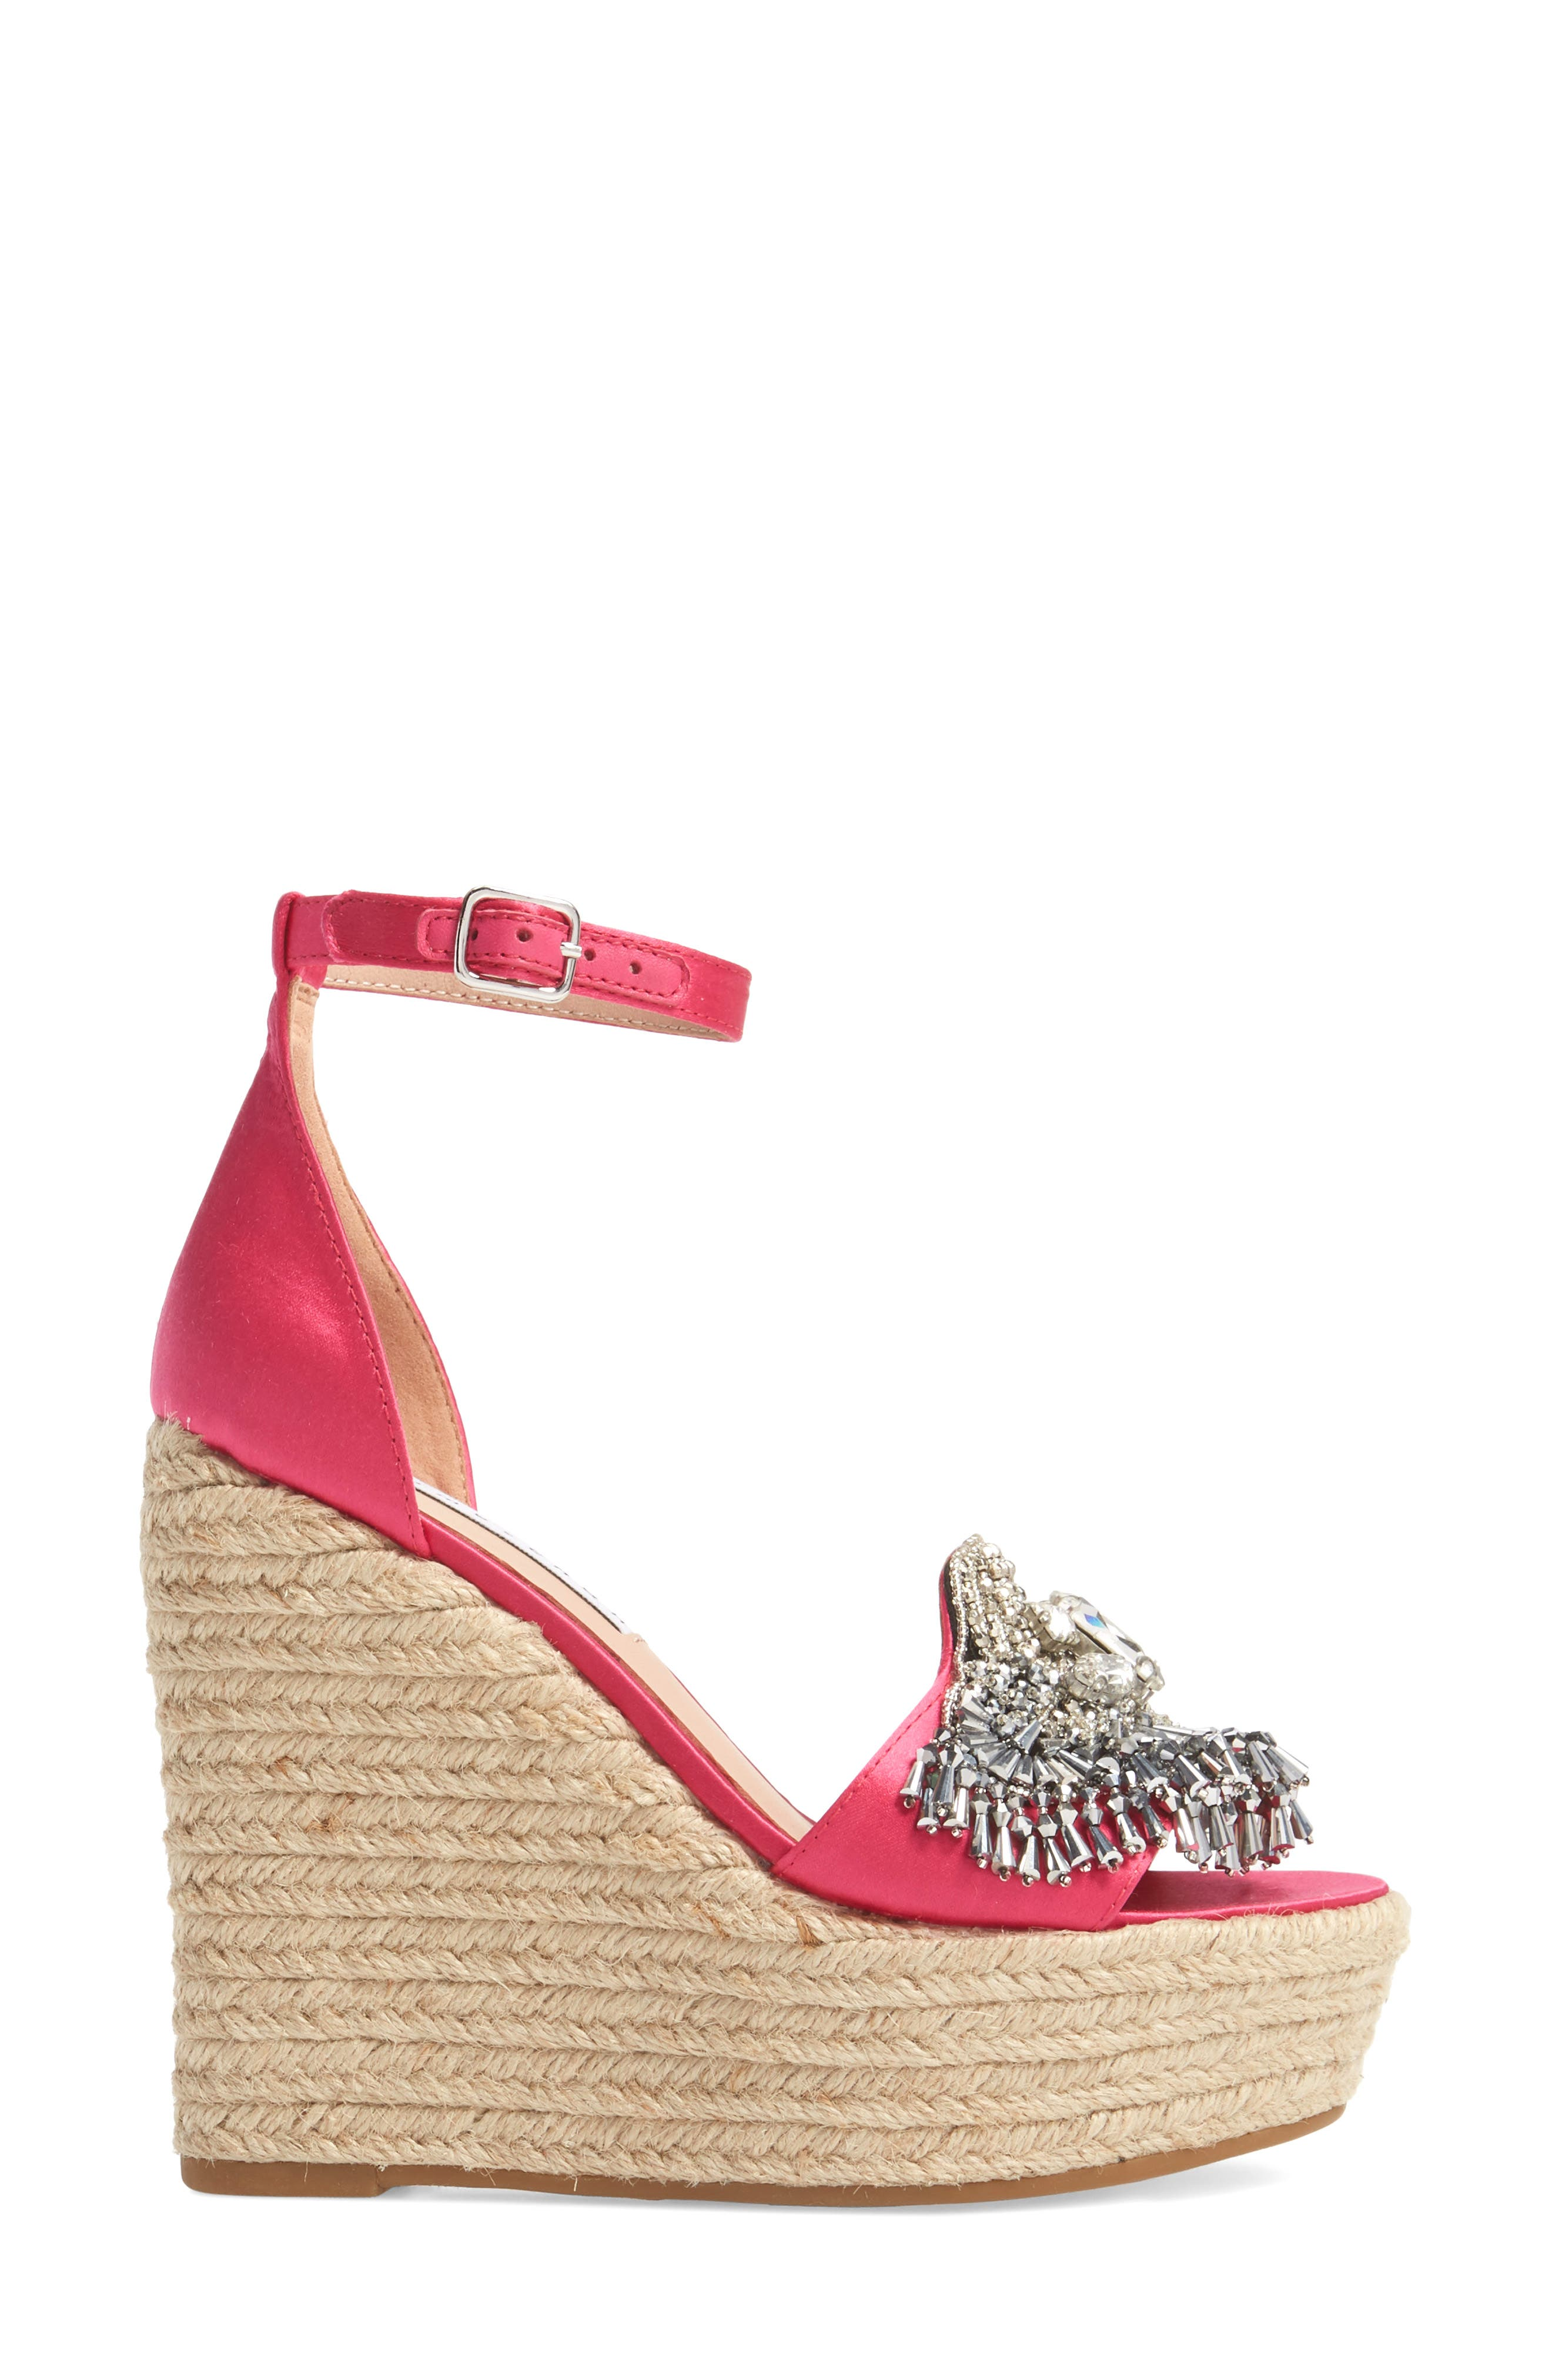 Maxim Platform Wedge Sandal,                             Alternate thumbnail 9, color,